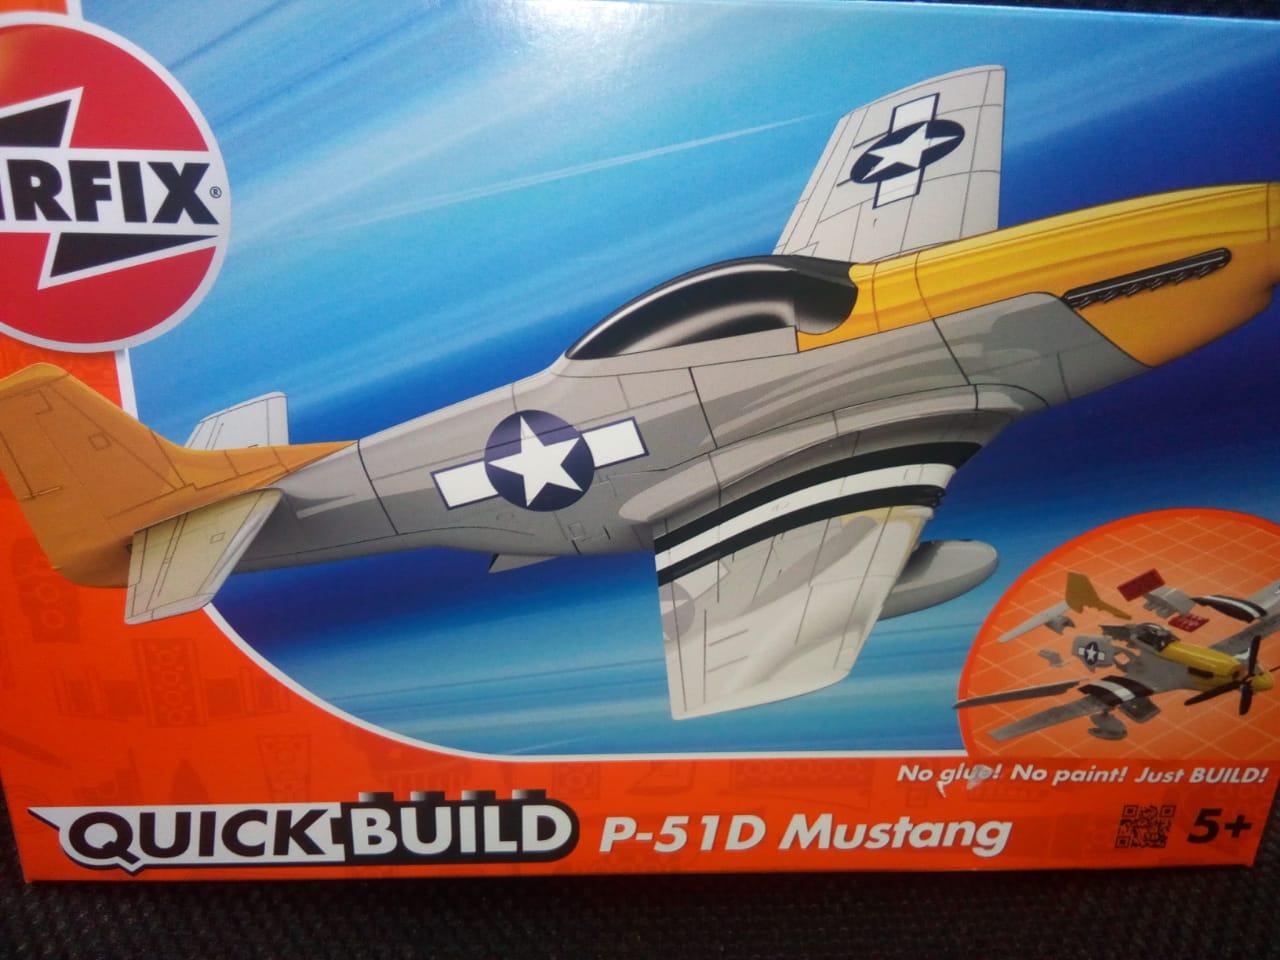 Quick buld P-51